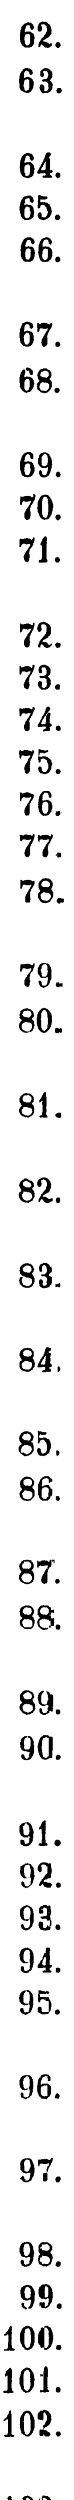 [merged small][merged small][merged small][merged small][merged small][merged small][merged small][merged small][merged small][ocr errors][merged small][merged small][merged small][ocr errors][merged small][merged small]